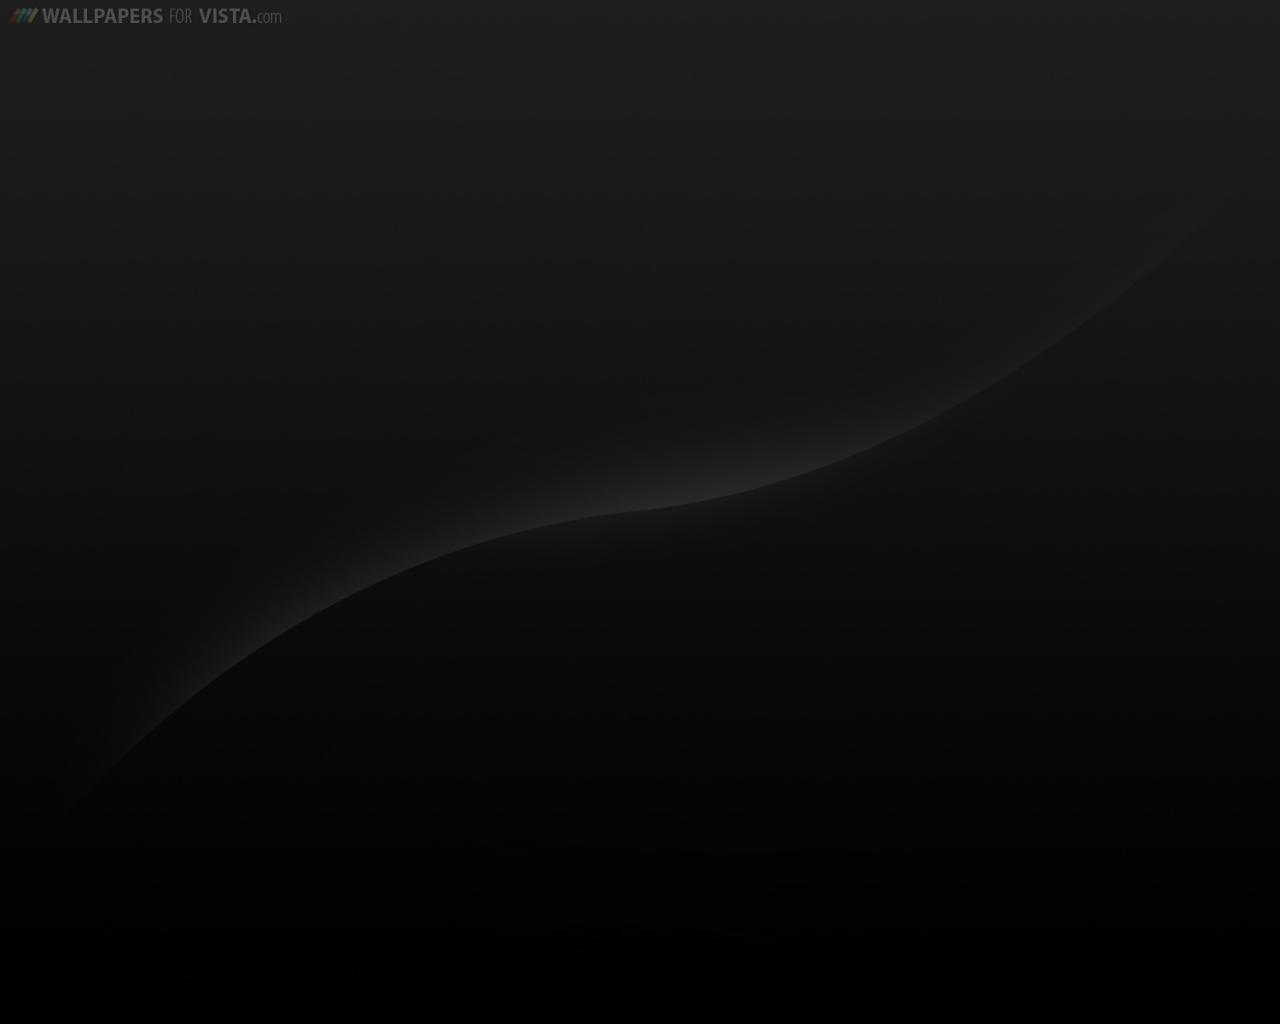 trololo blogg: Hubble Space Wallpaper Backgrounds